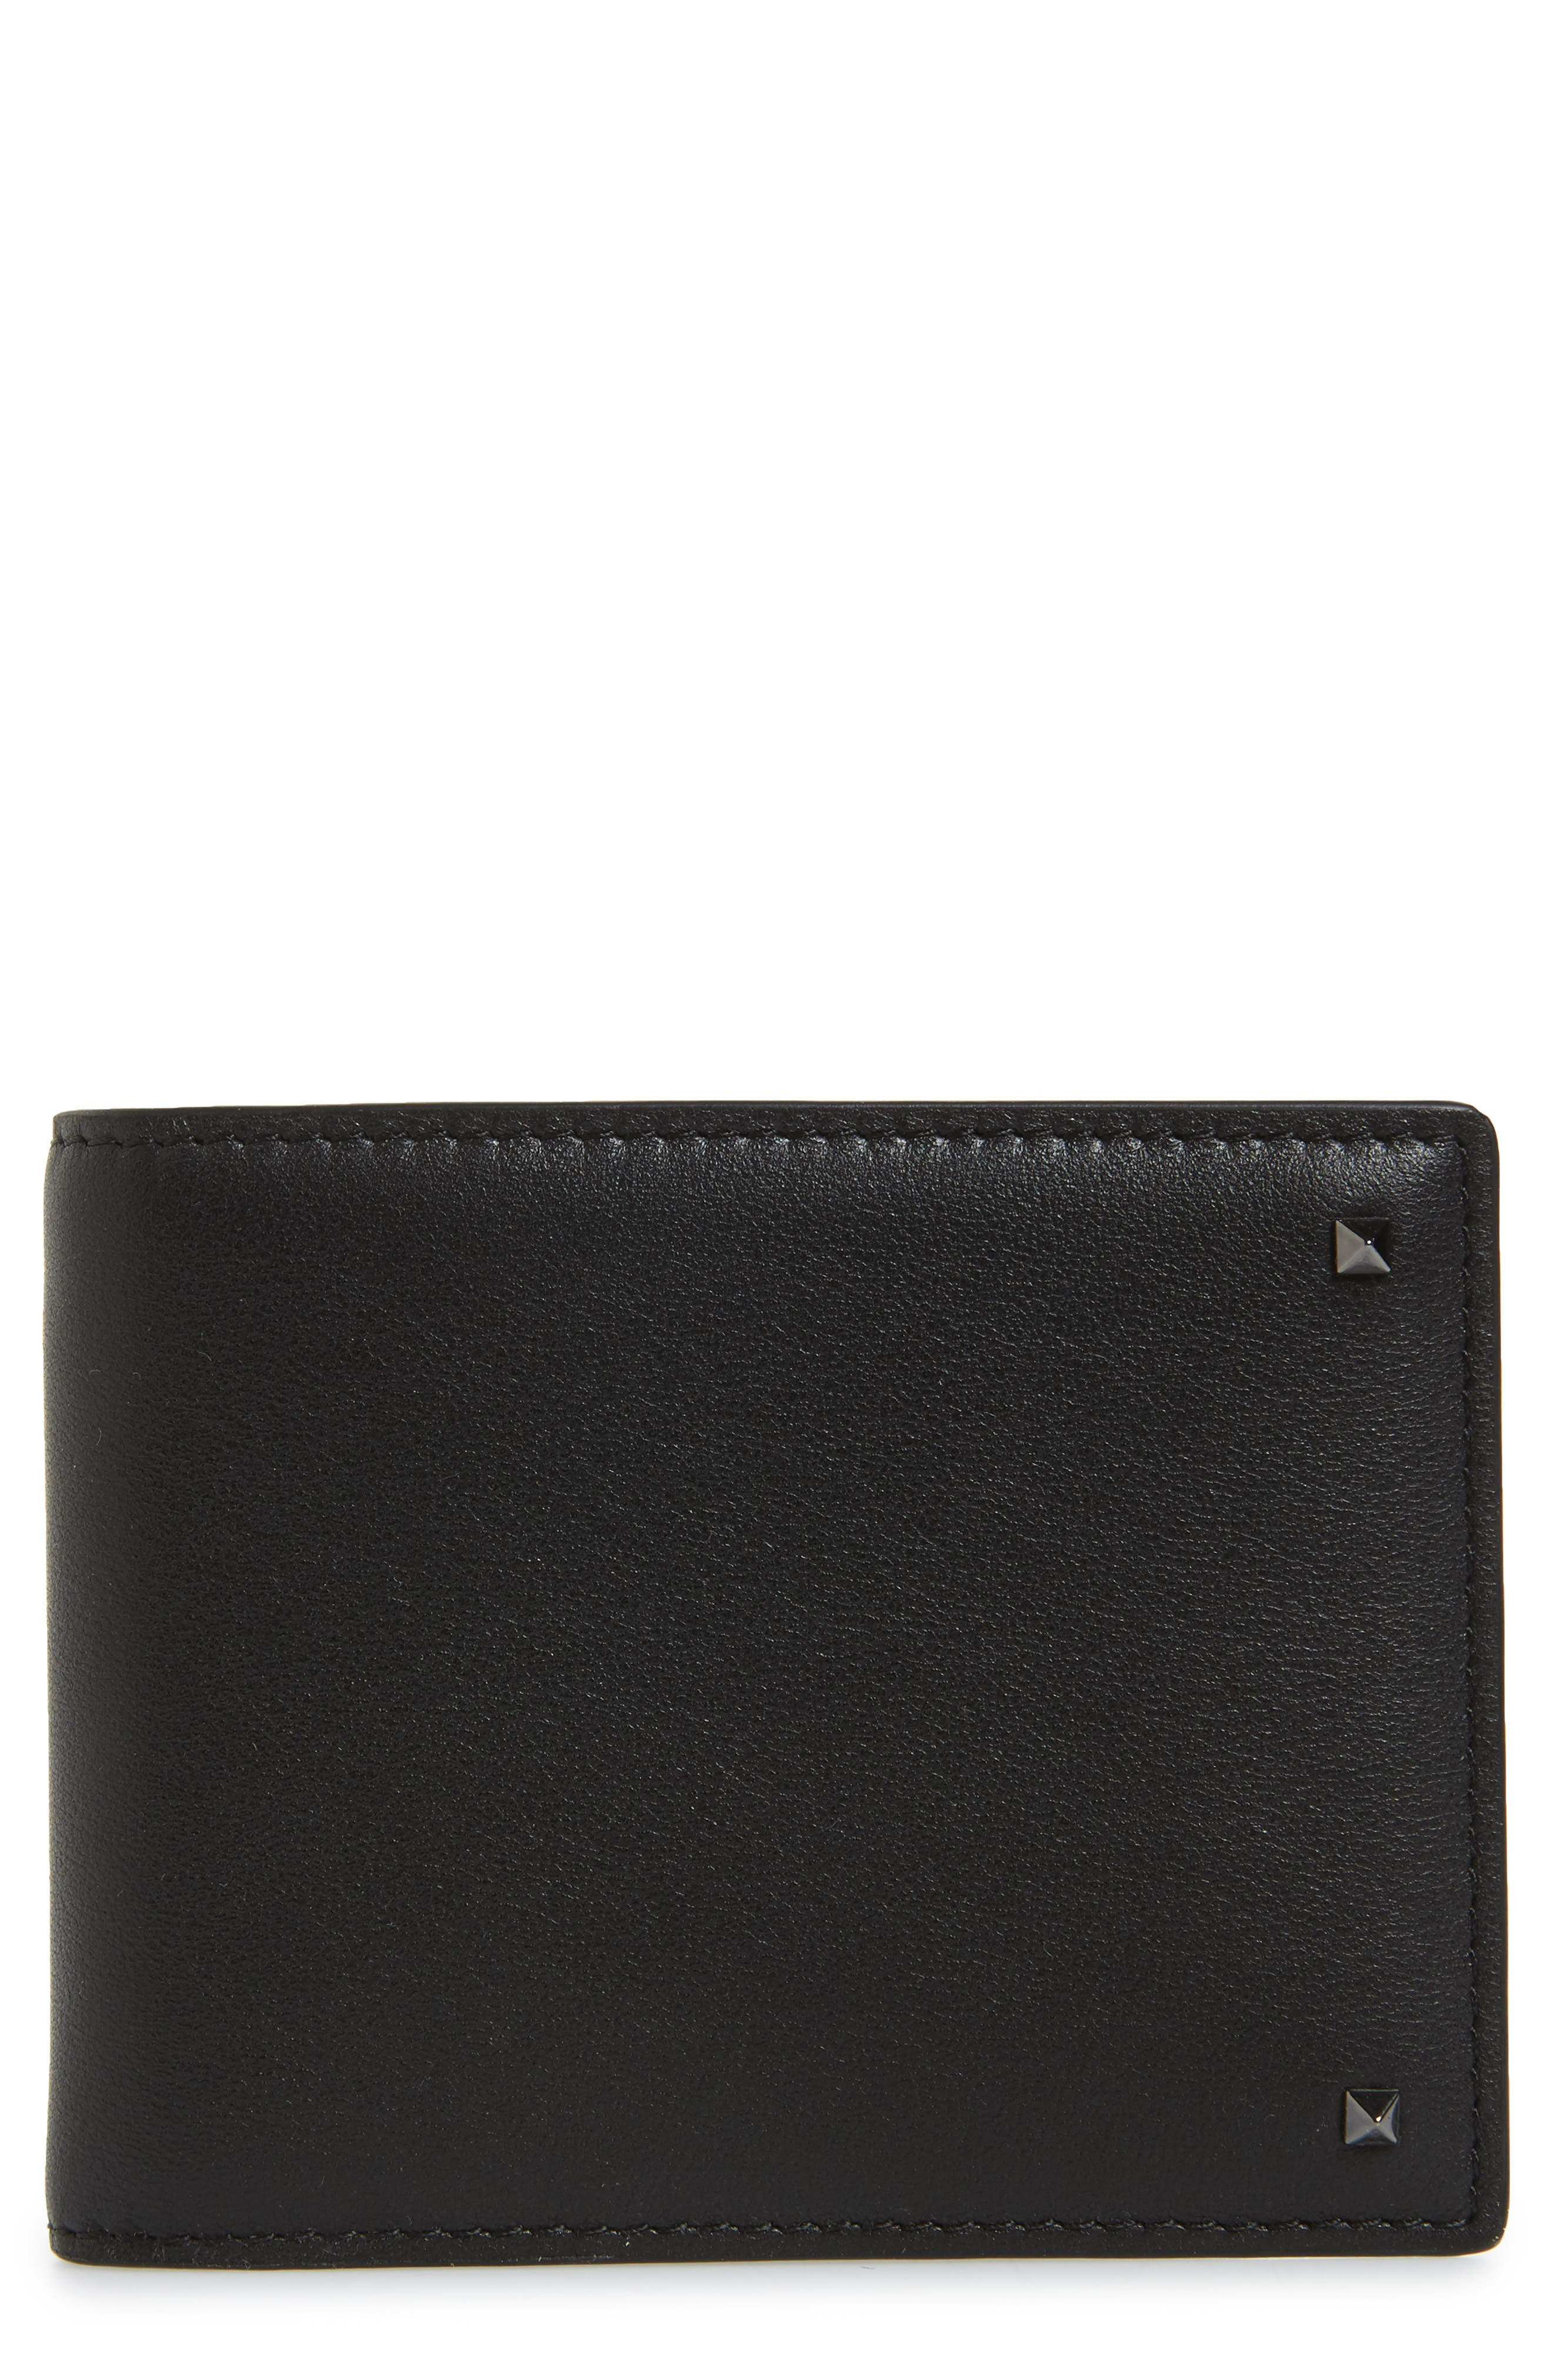 GARAVANI Stud Leather Money Clip Card Case,                         Main,                         color, Black